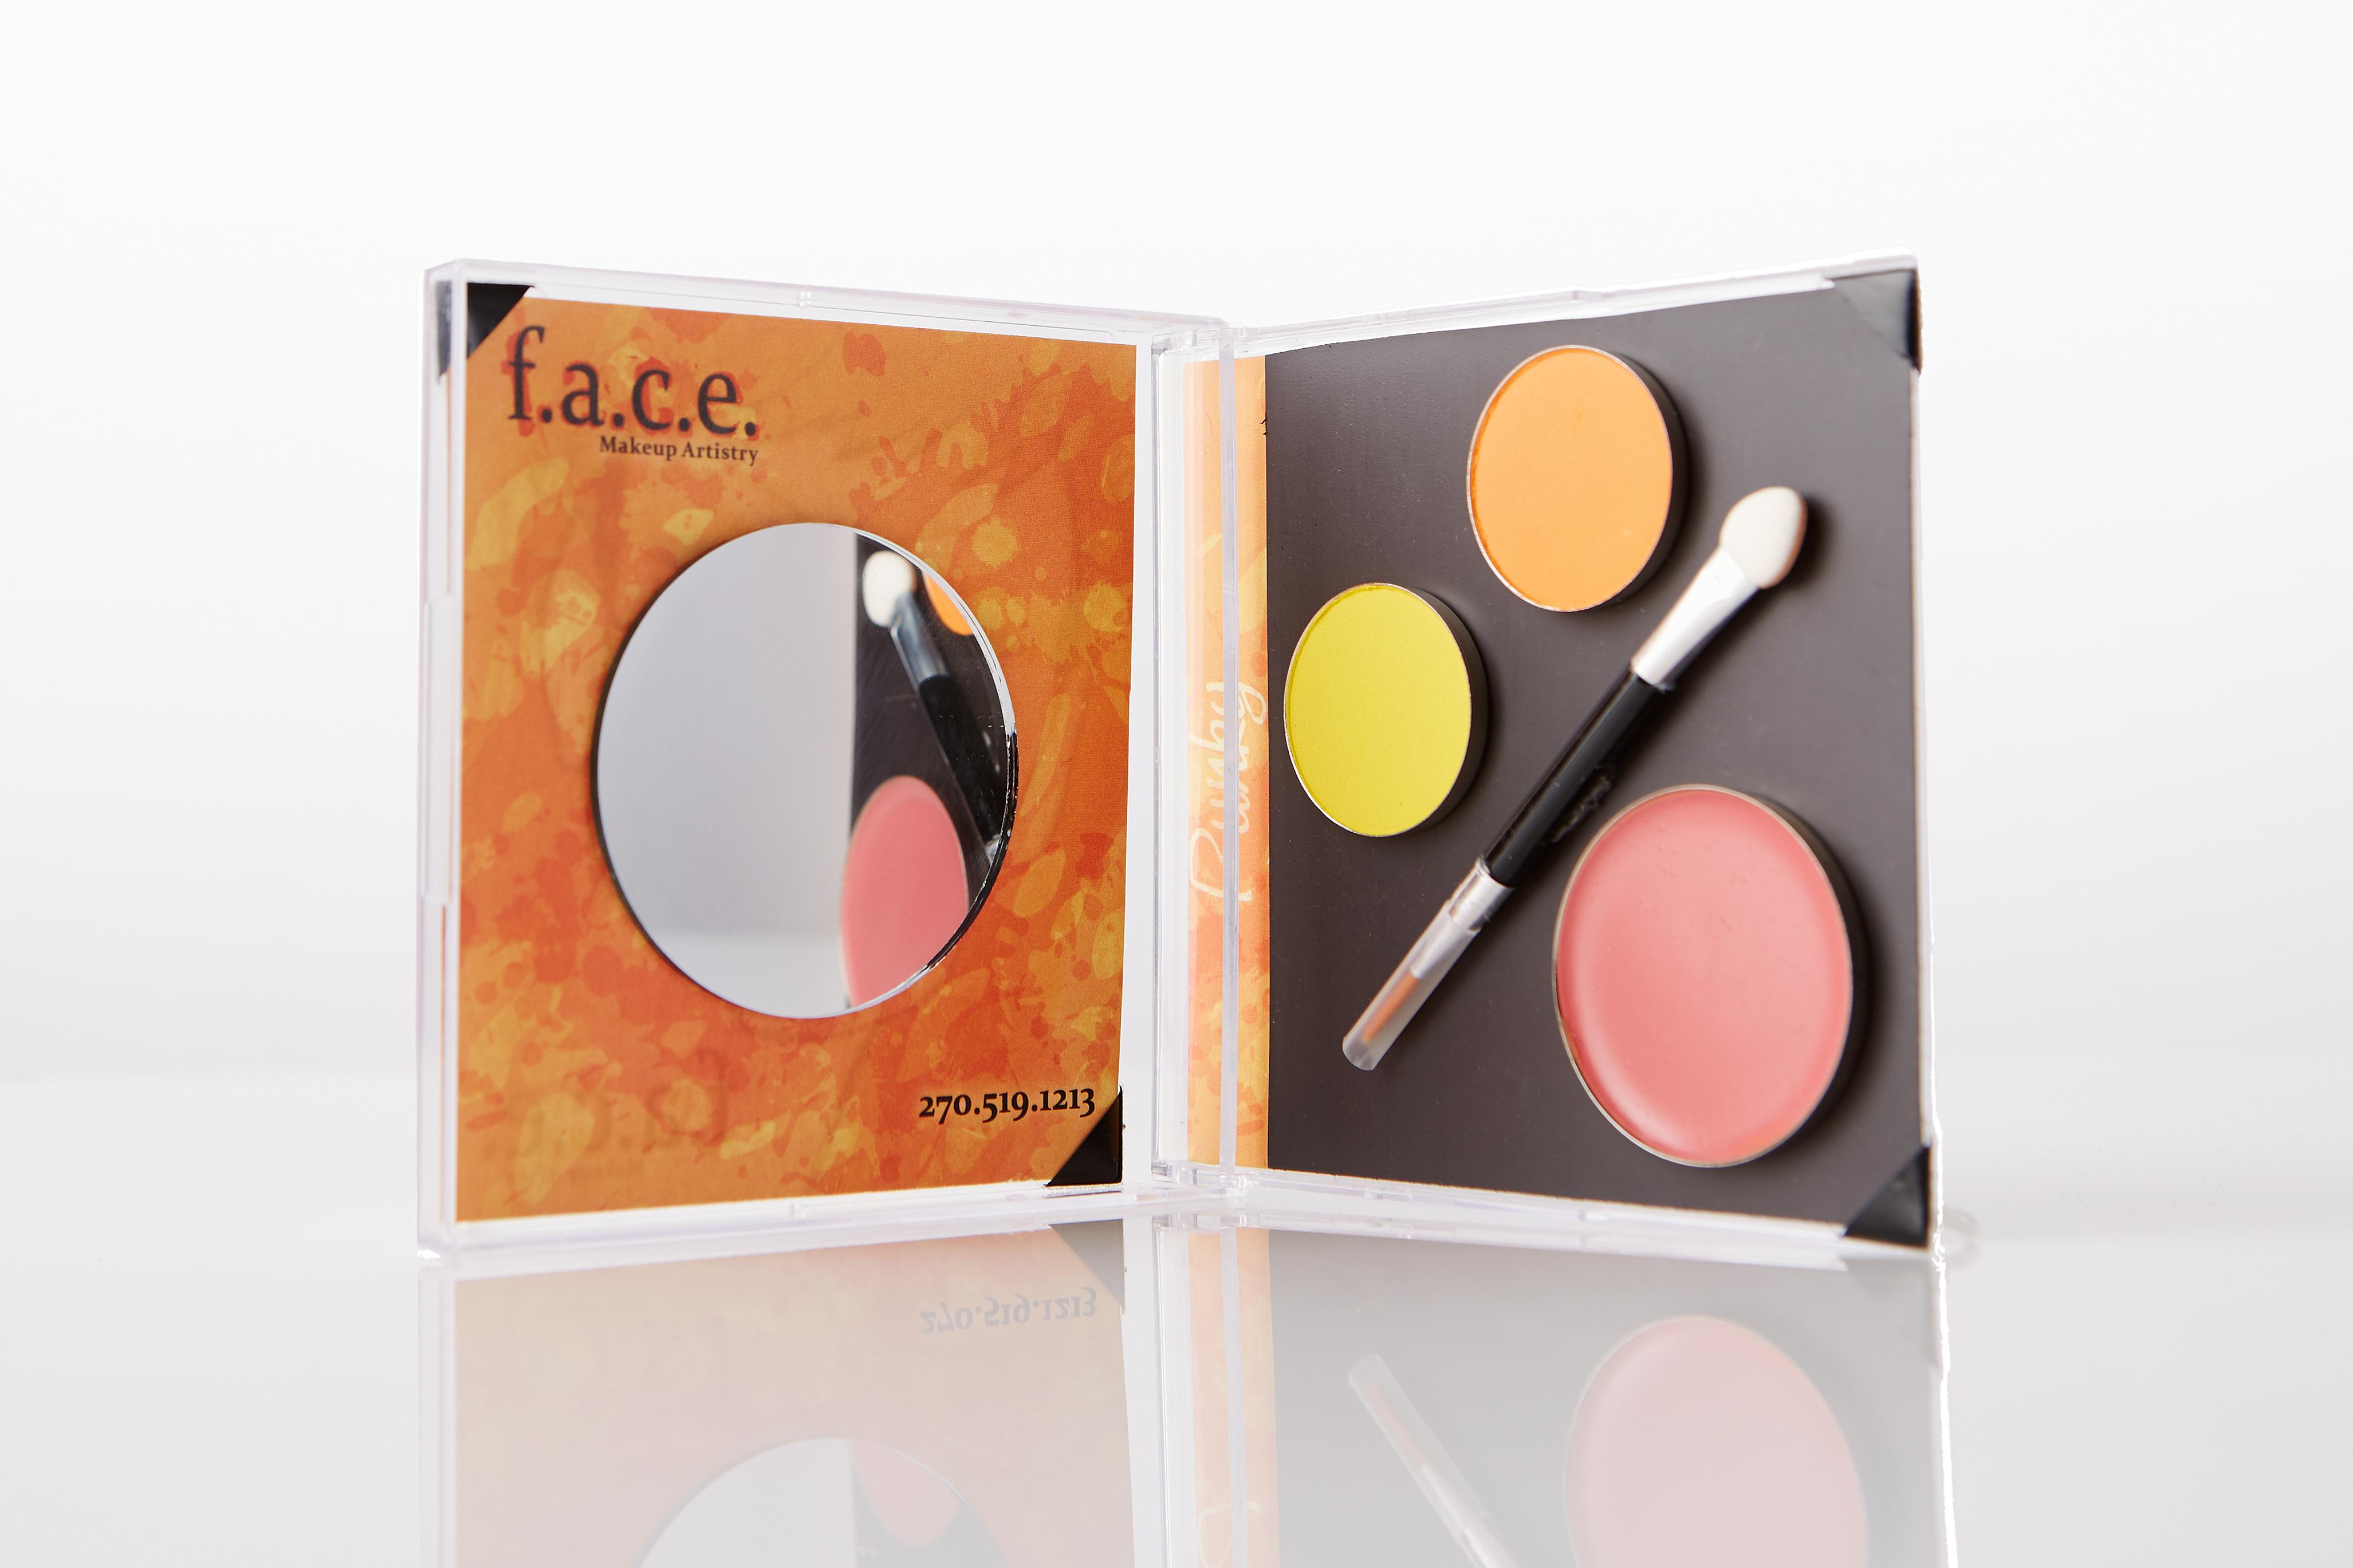 7L3A1583Erin Hendley - Brushes & Makeup Retail - June 2015 - Brad Rankin Studio